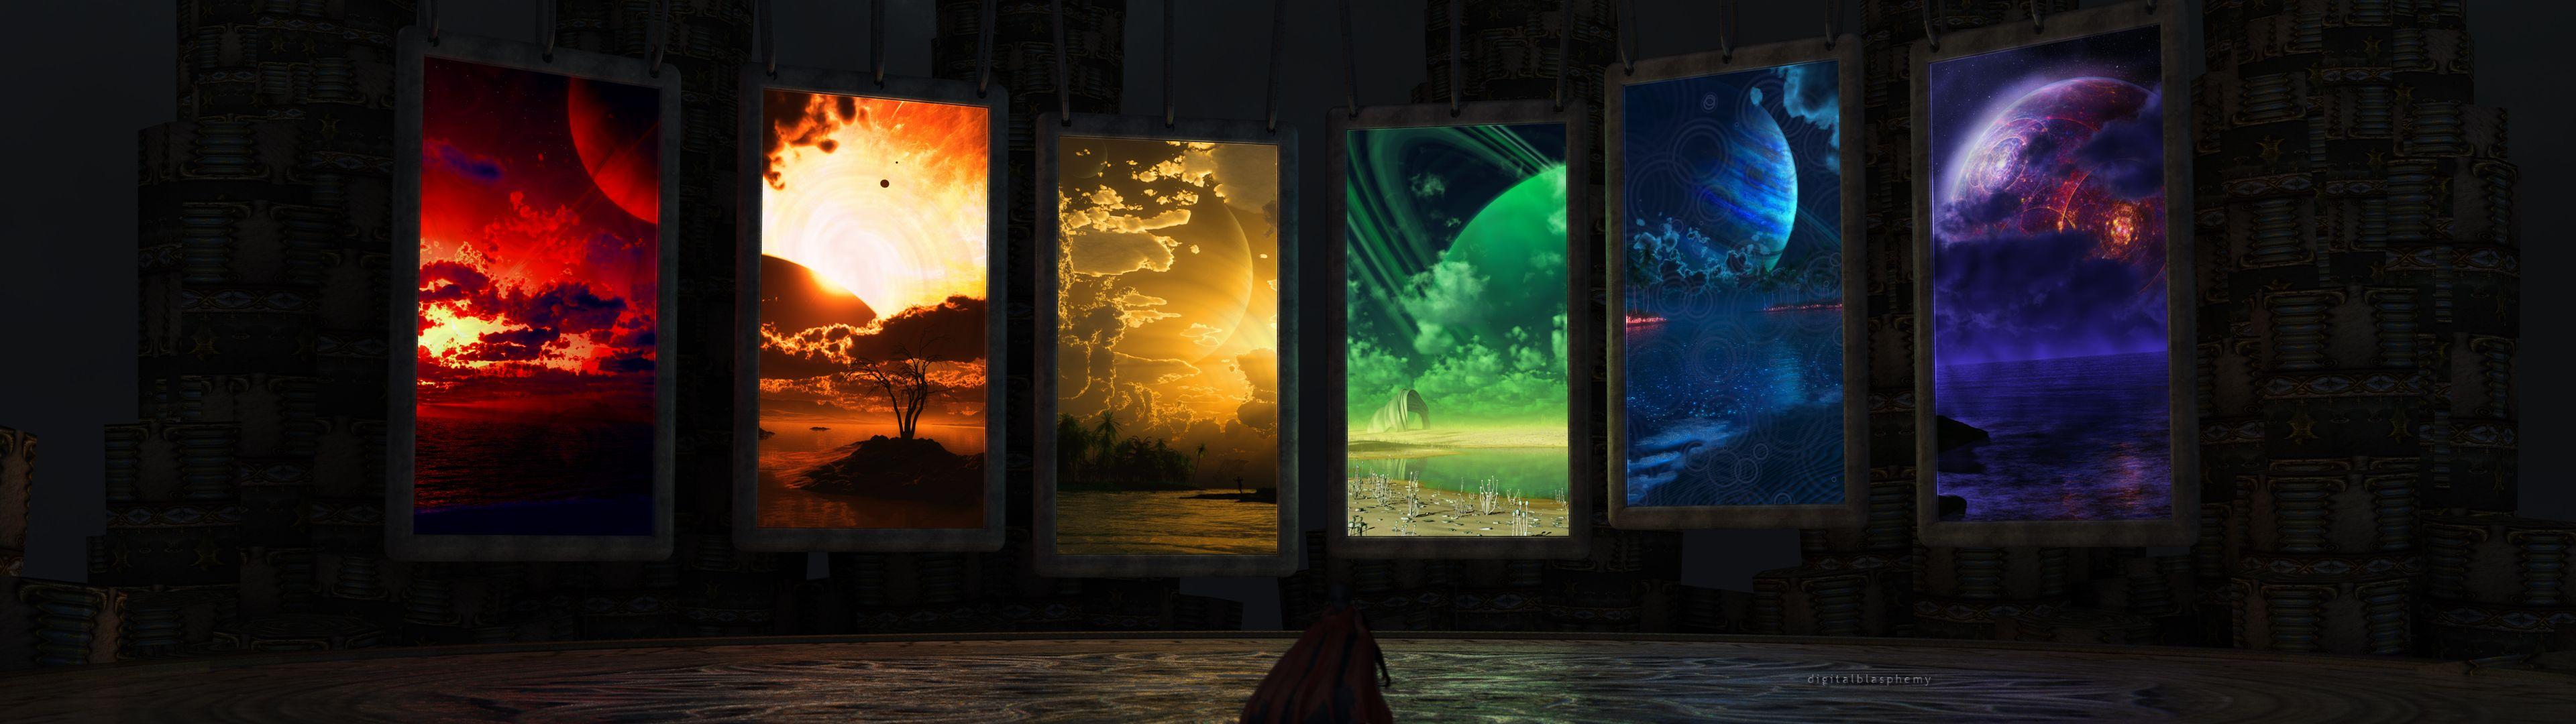 Wallpaper Robot Sci Fi Hd 110 All Images 3840x1080 Wallpaper Dual Monitor Wallpaper Screen Wallpaper Hd